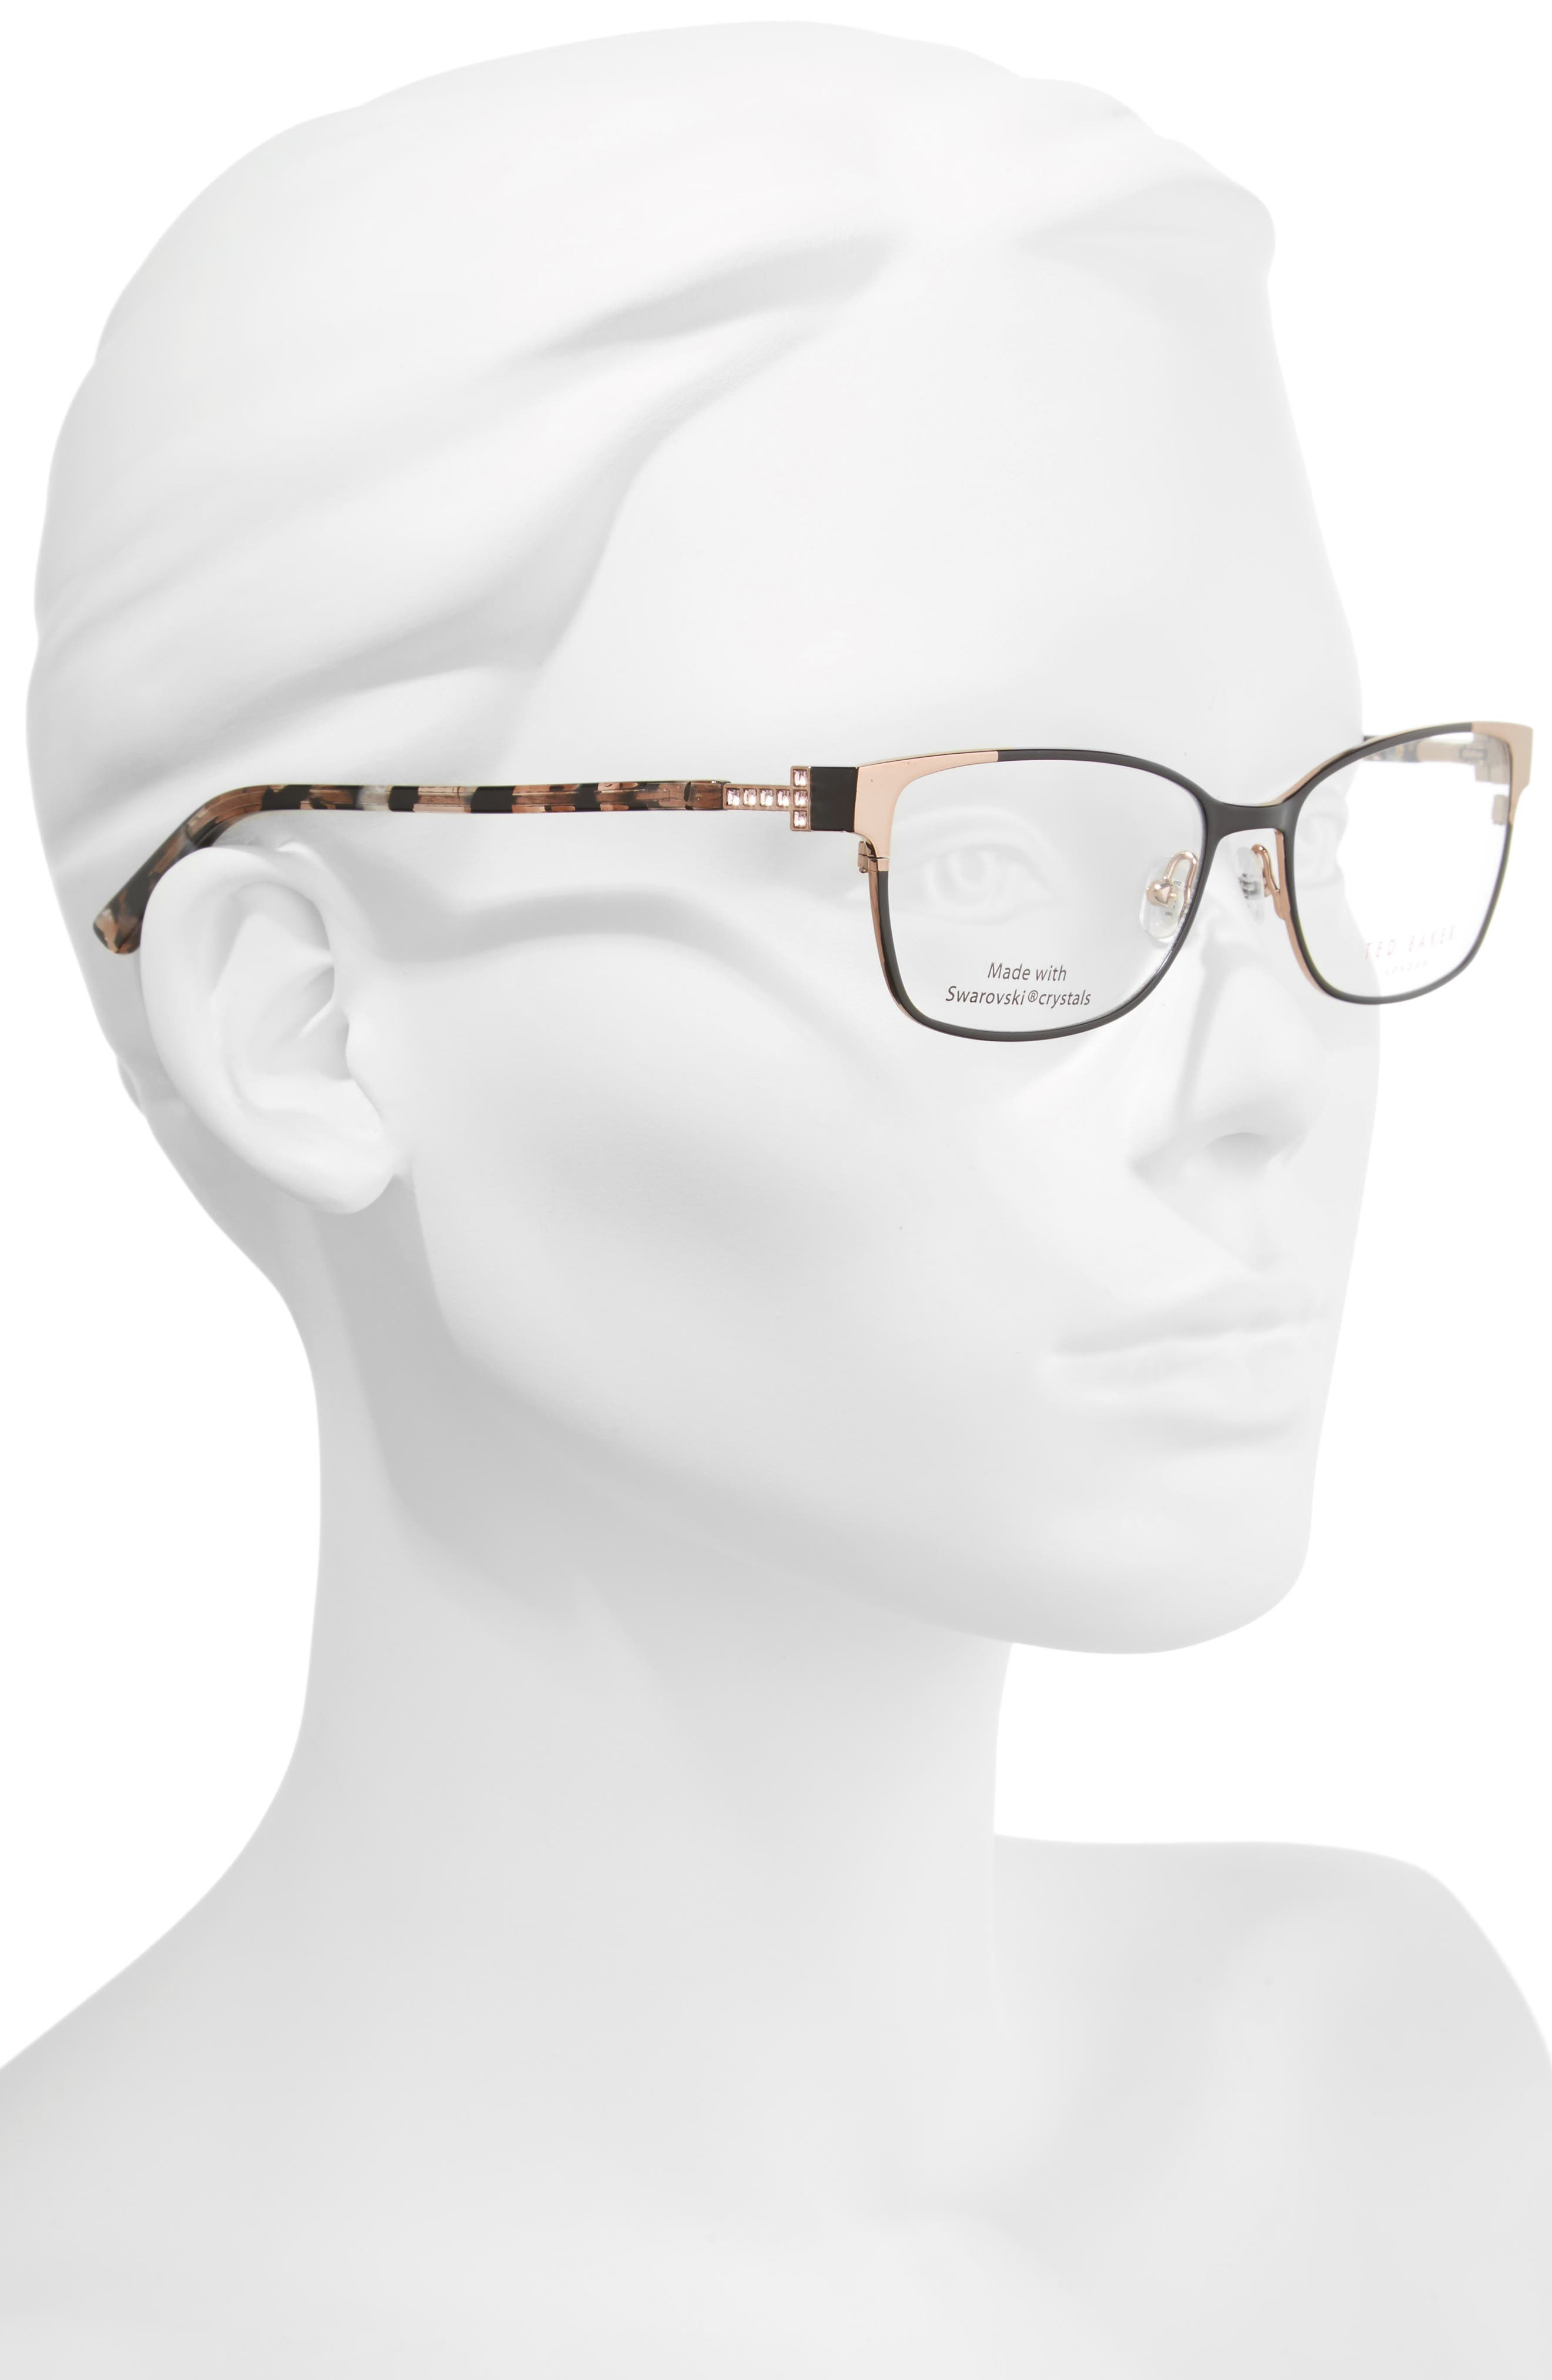 52mm Crystal Rectangular Optical Glasses,                             Alternate thumbnail 2, color,                             001